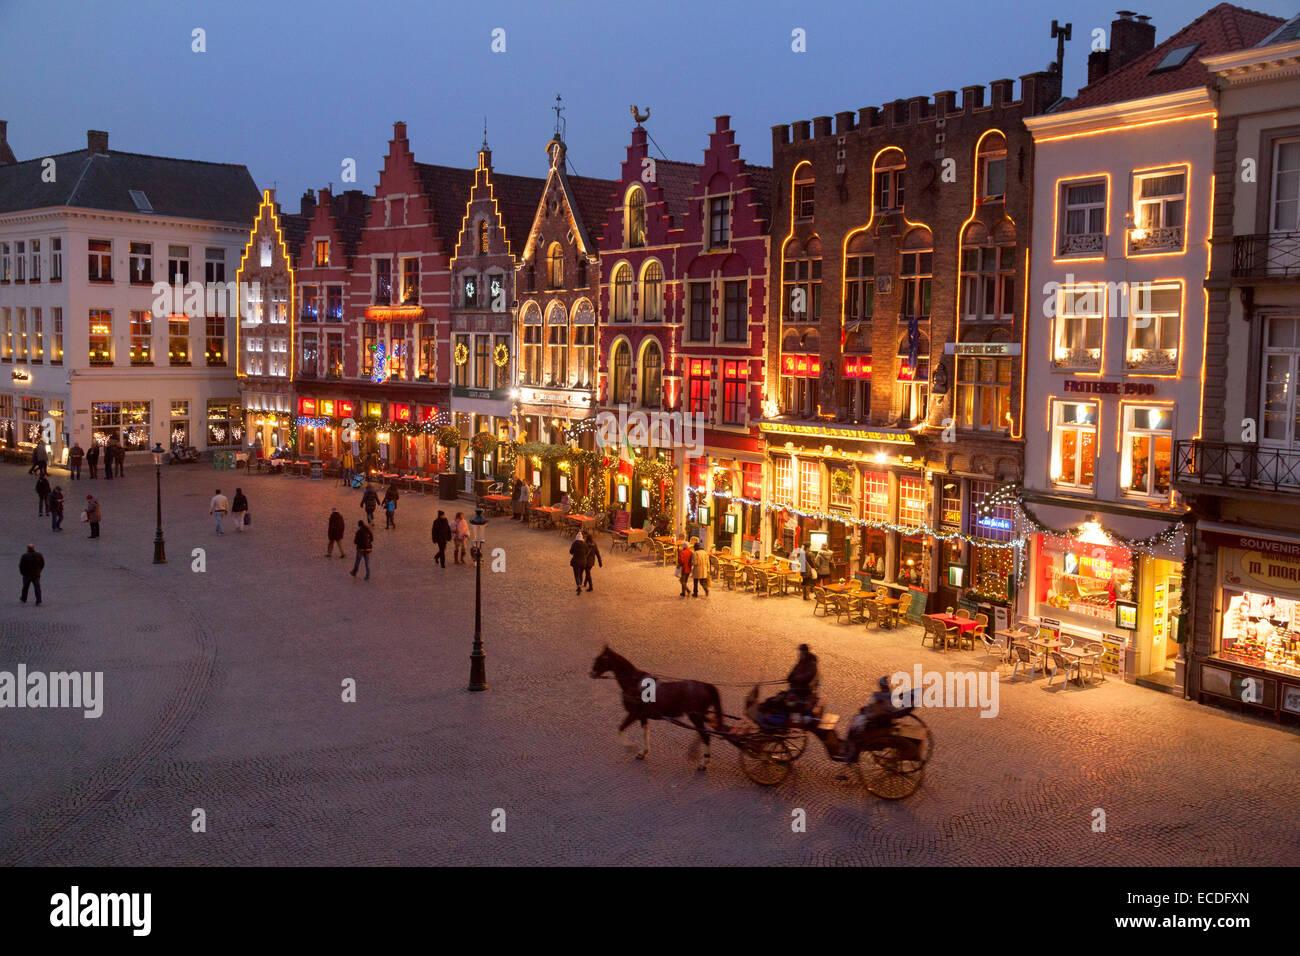 restaurants-and-cafes-in-market-square-markt-square-at-christmas-bruges-ECDFXN.jpg